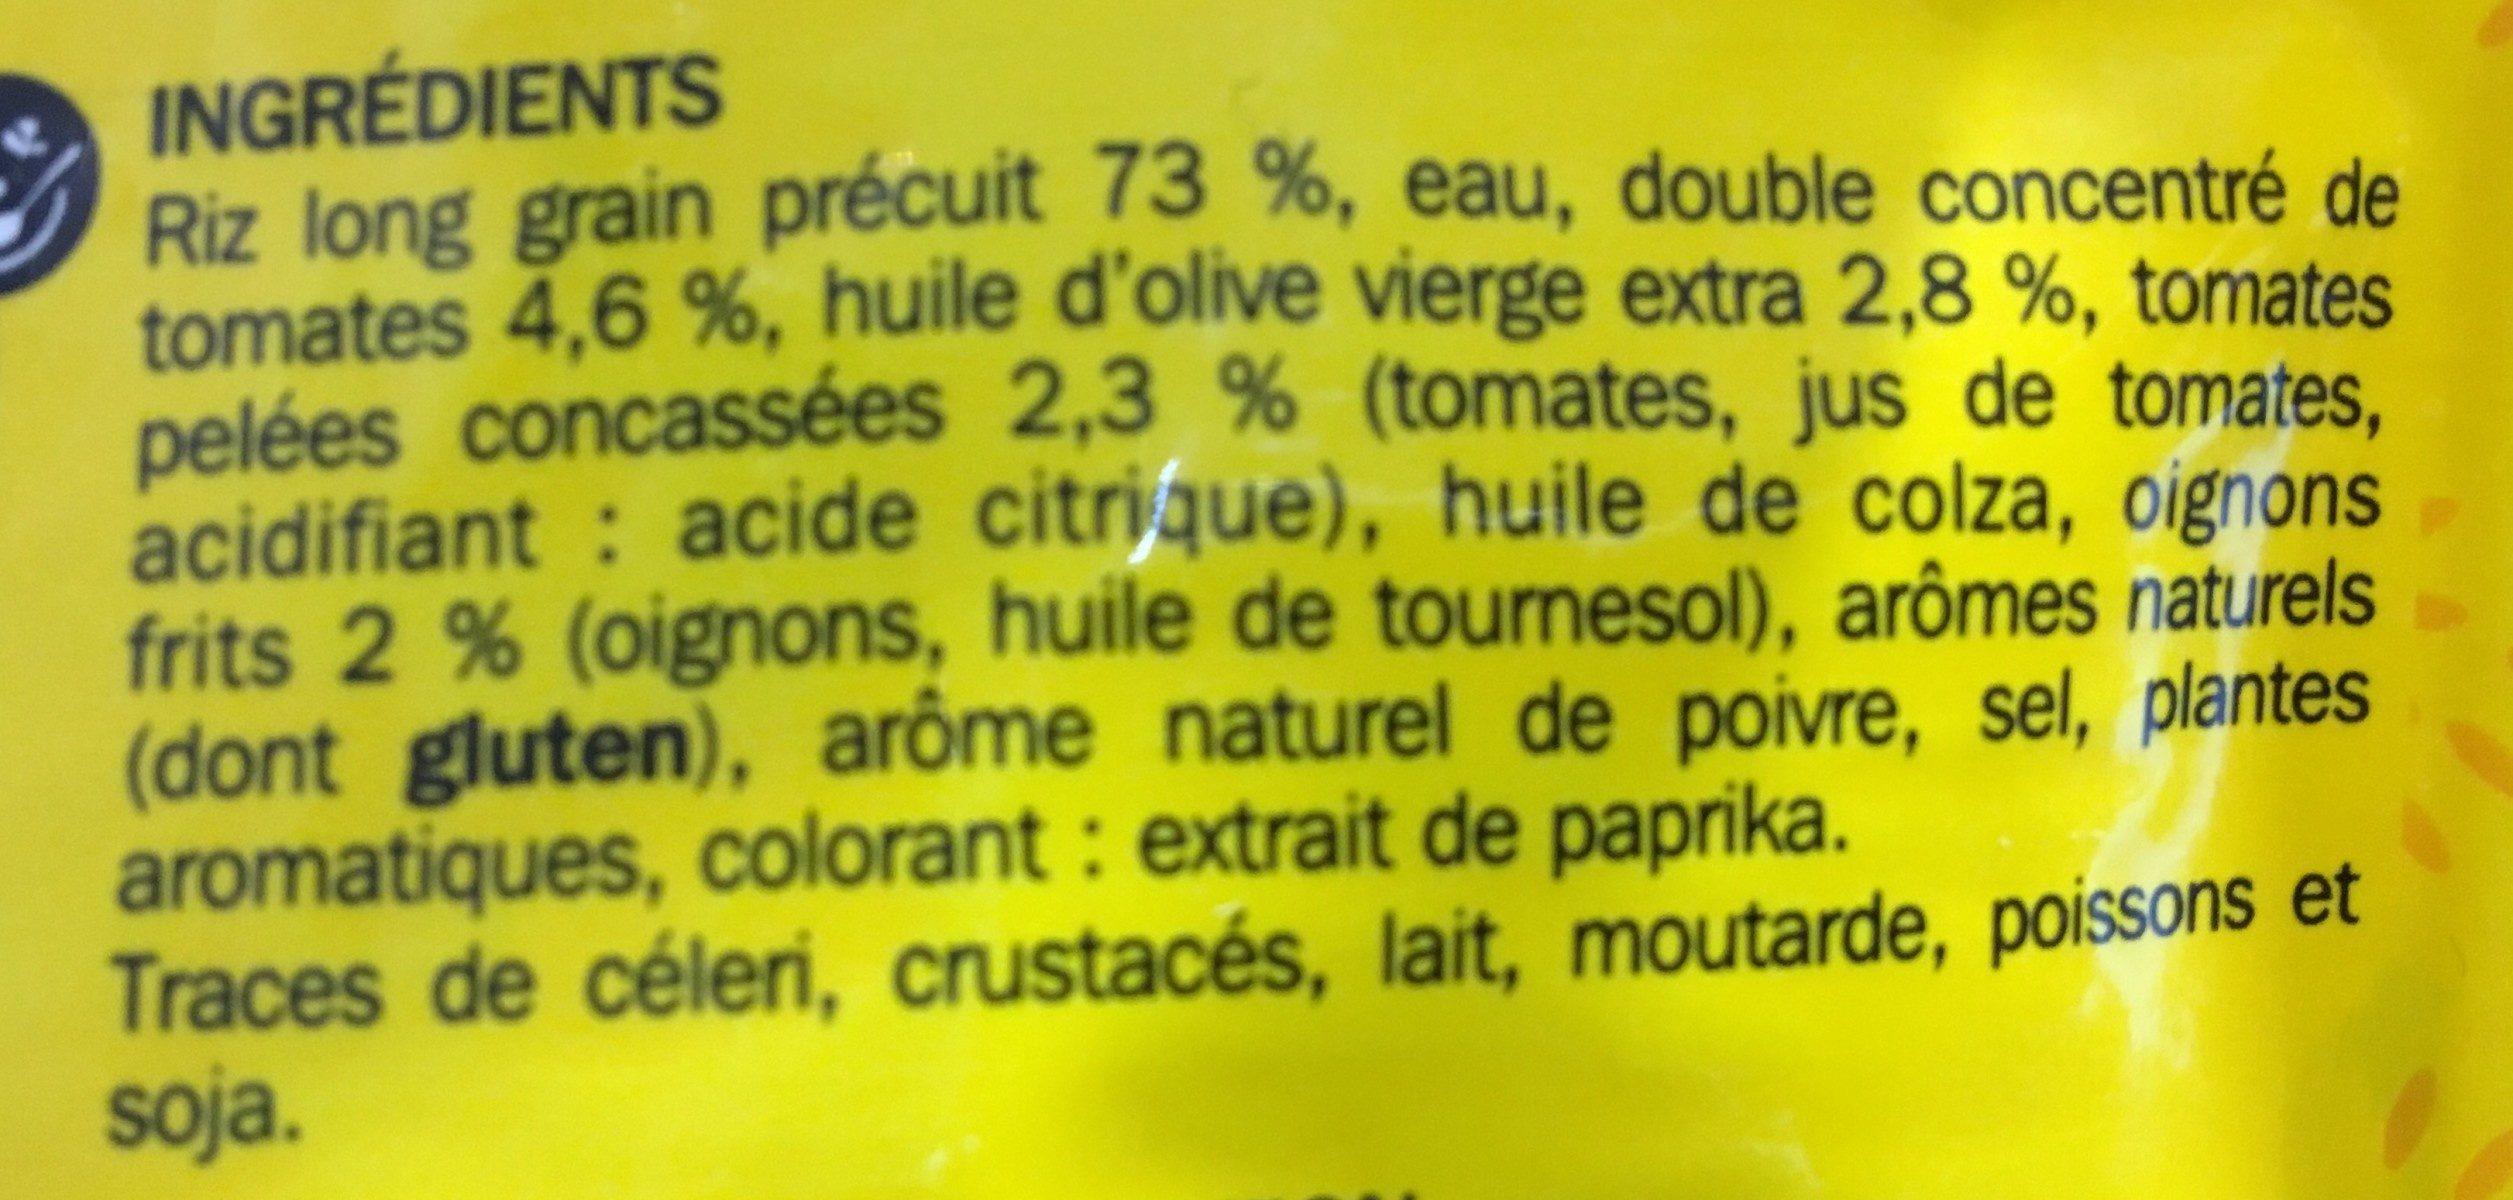 Riz a la mediteraneenne doyp - Ingrediënten - fr